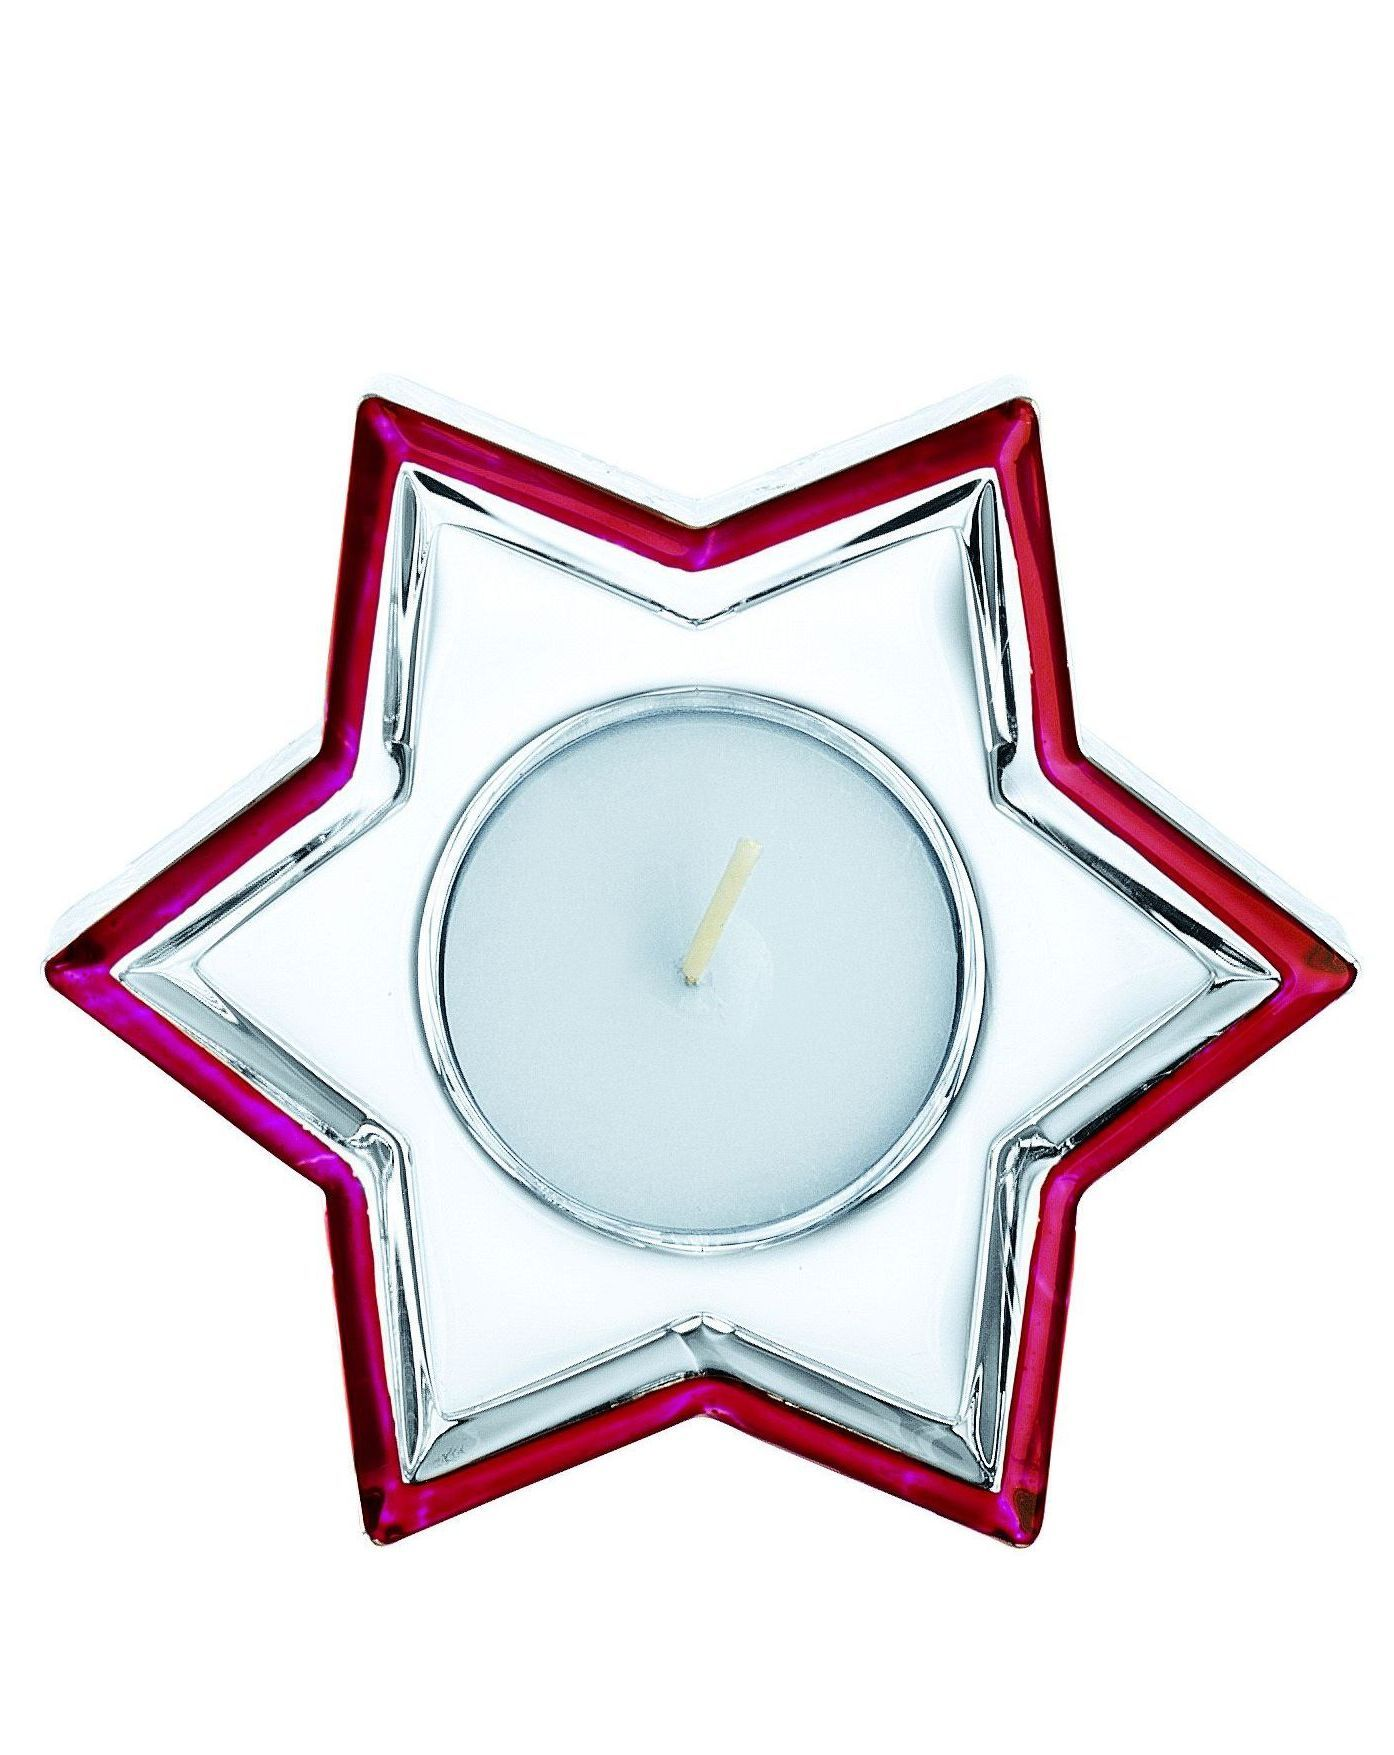 Подсвечники Подсвечник Nachtmann Crystal Christmas Звезда красная podsvechnik-nachtmann-crystal-christmas-zvezda-krasnaya-germaniya.jpg